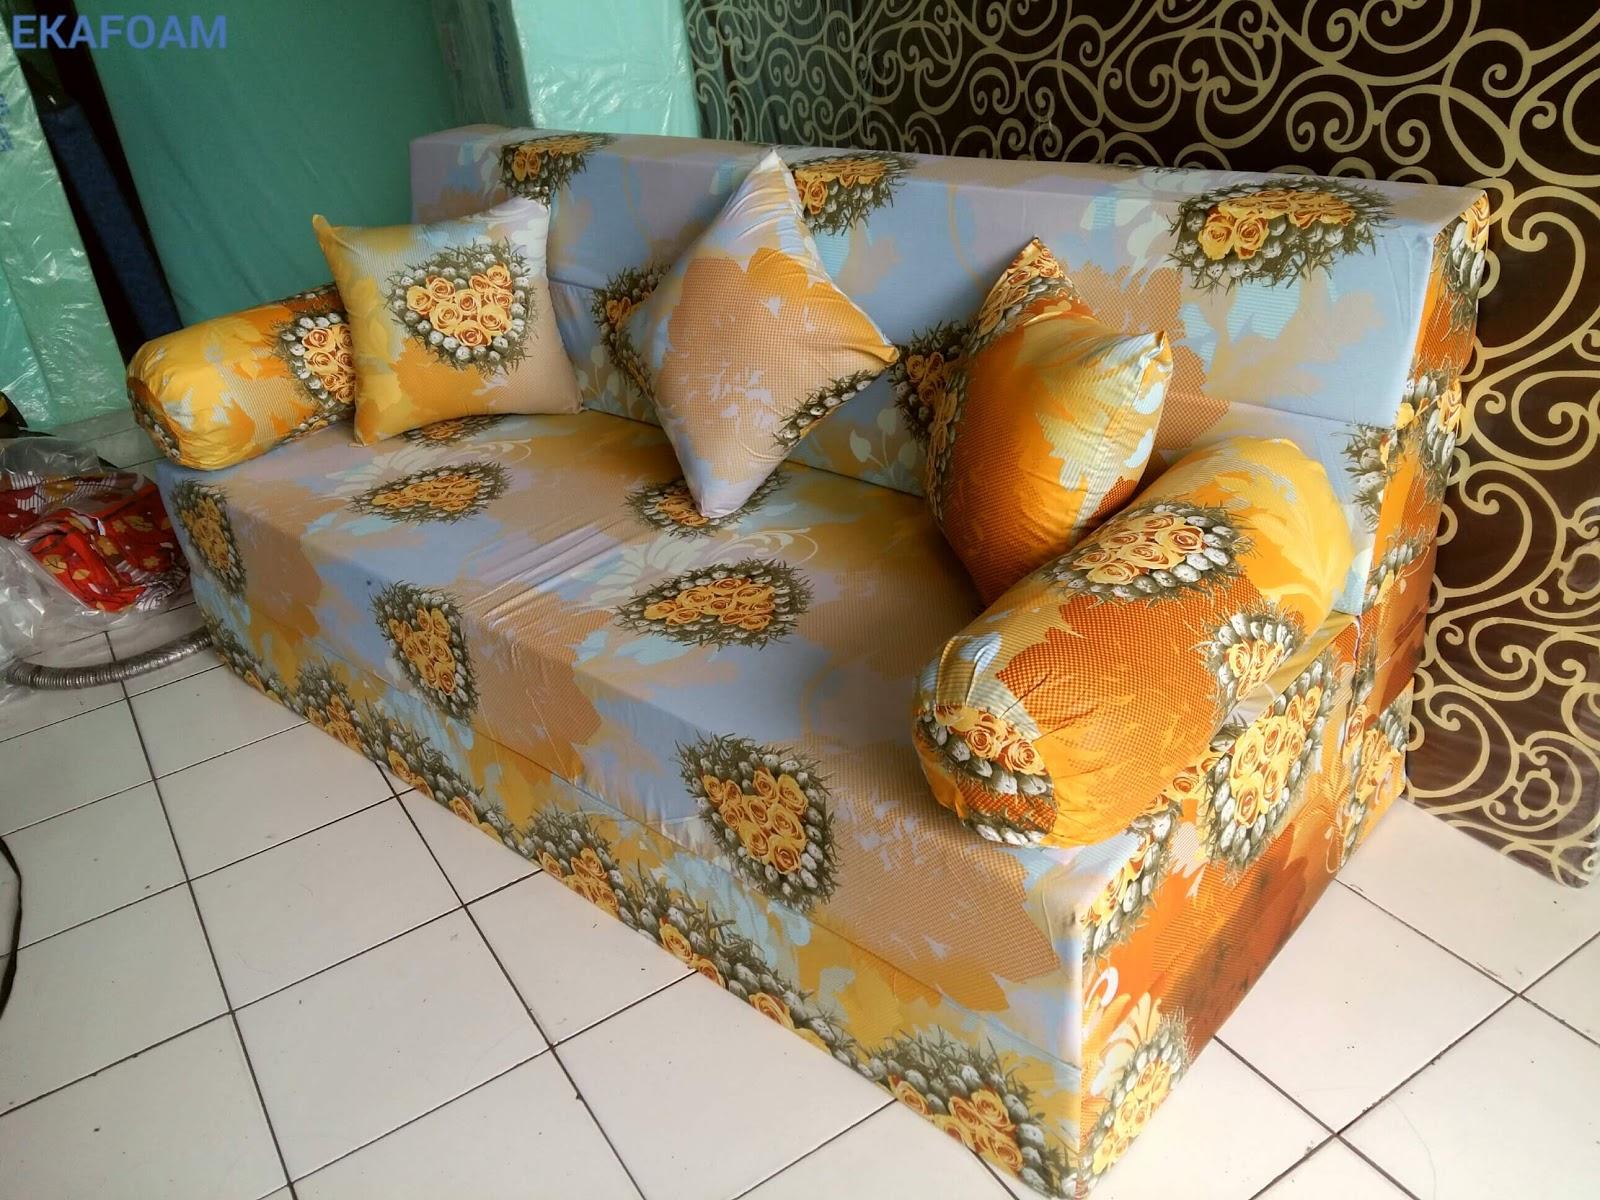 harga sofa bed inoac 2017 sleeper vs air mattress terbaru agen jual kasur busa